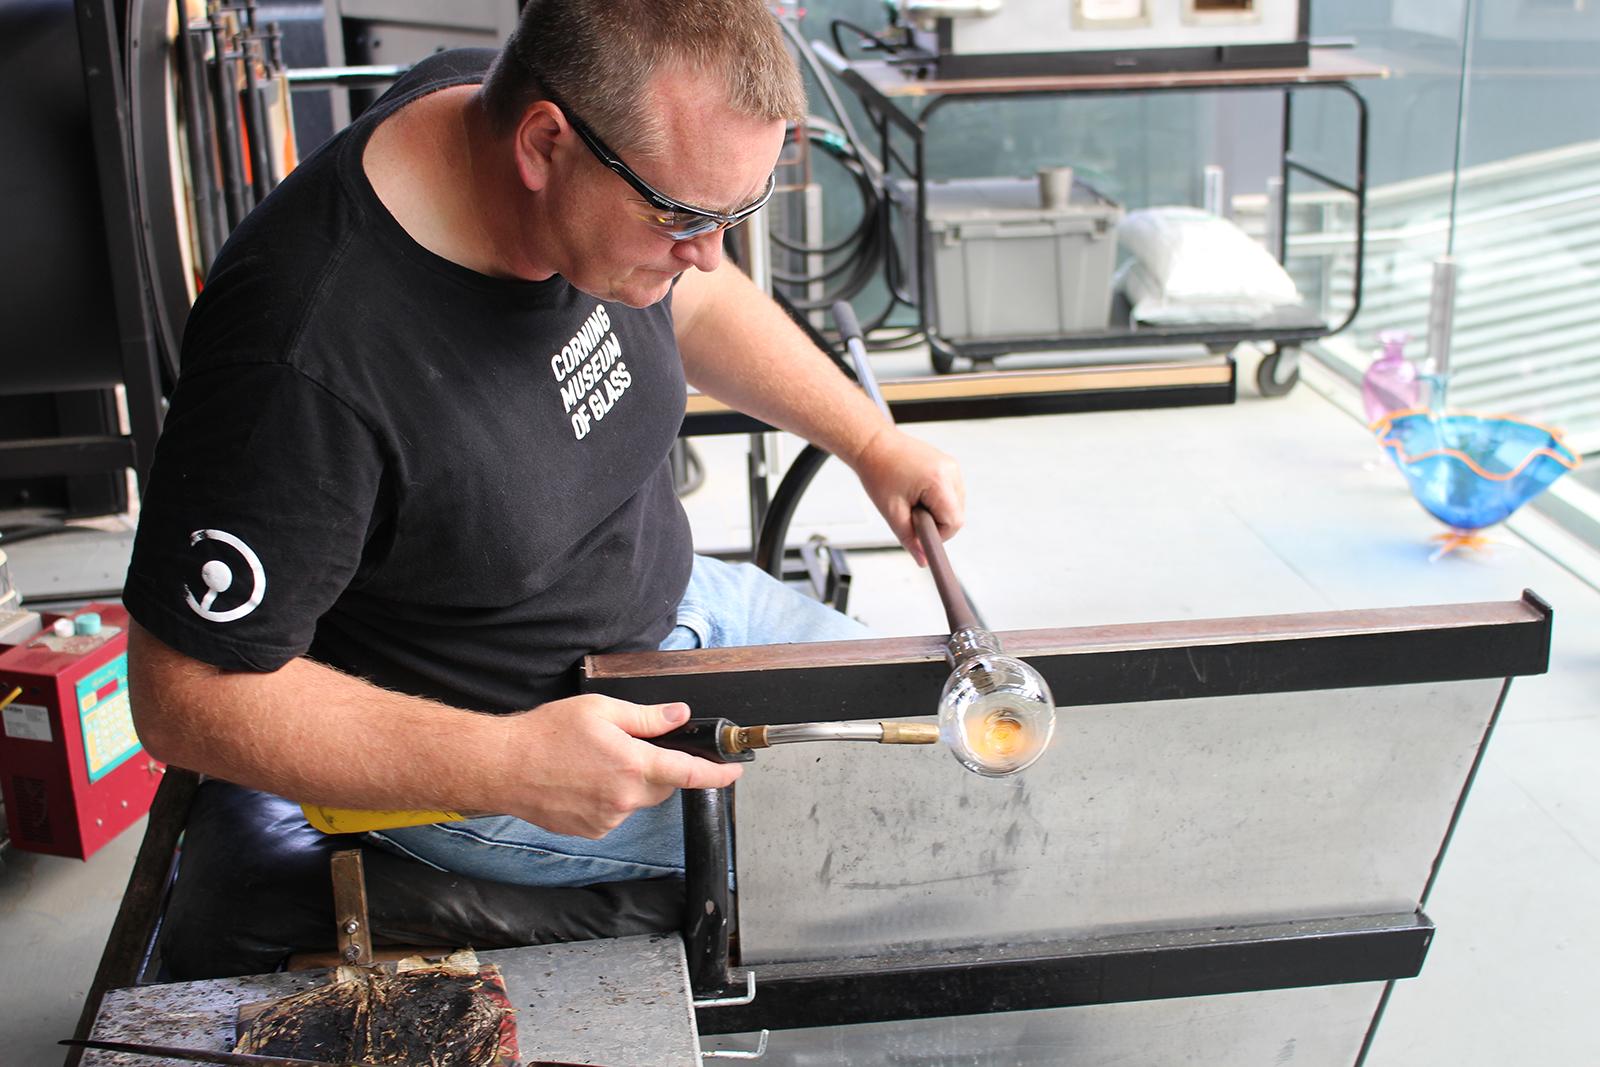 Glassmaker George Kennard works on a whiskey glass prototype by designer Bridget Sheehan at GlassLab